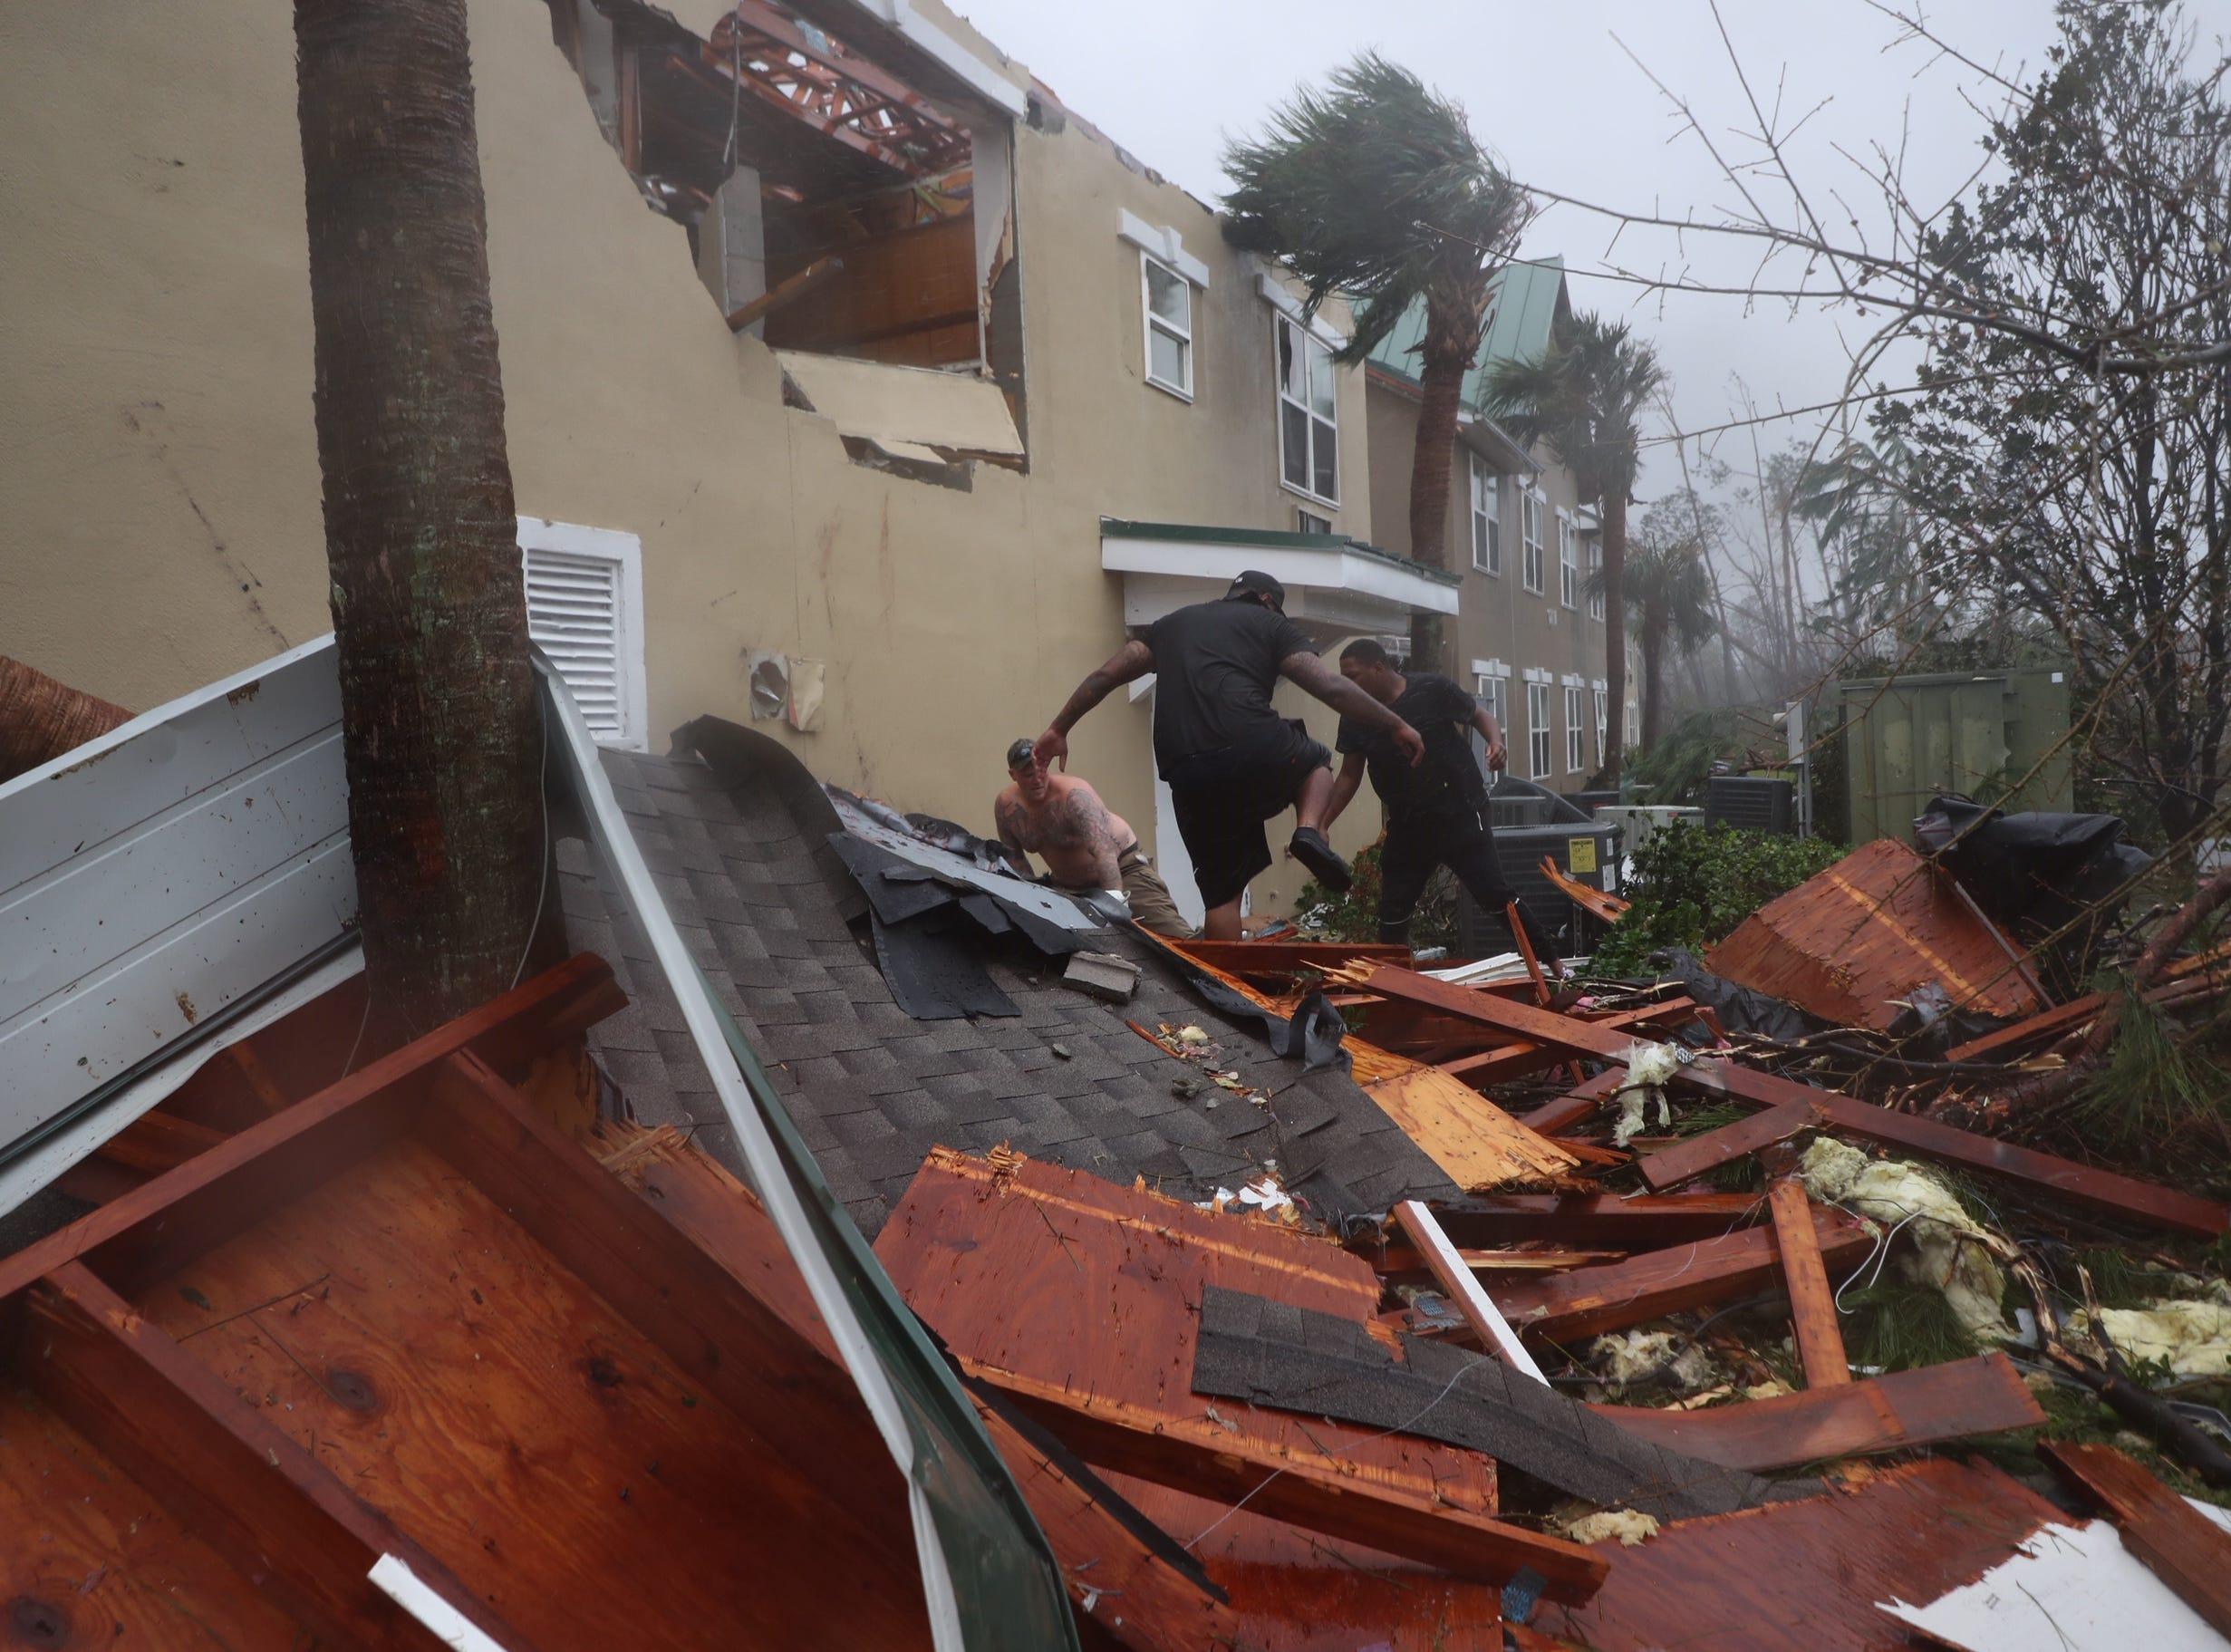 Oct 10, 2018; Panama City, FL, USA; Heavy damage caused by Hurricane Michael in Panama City, Fla.